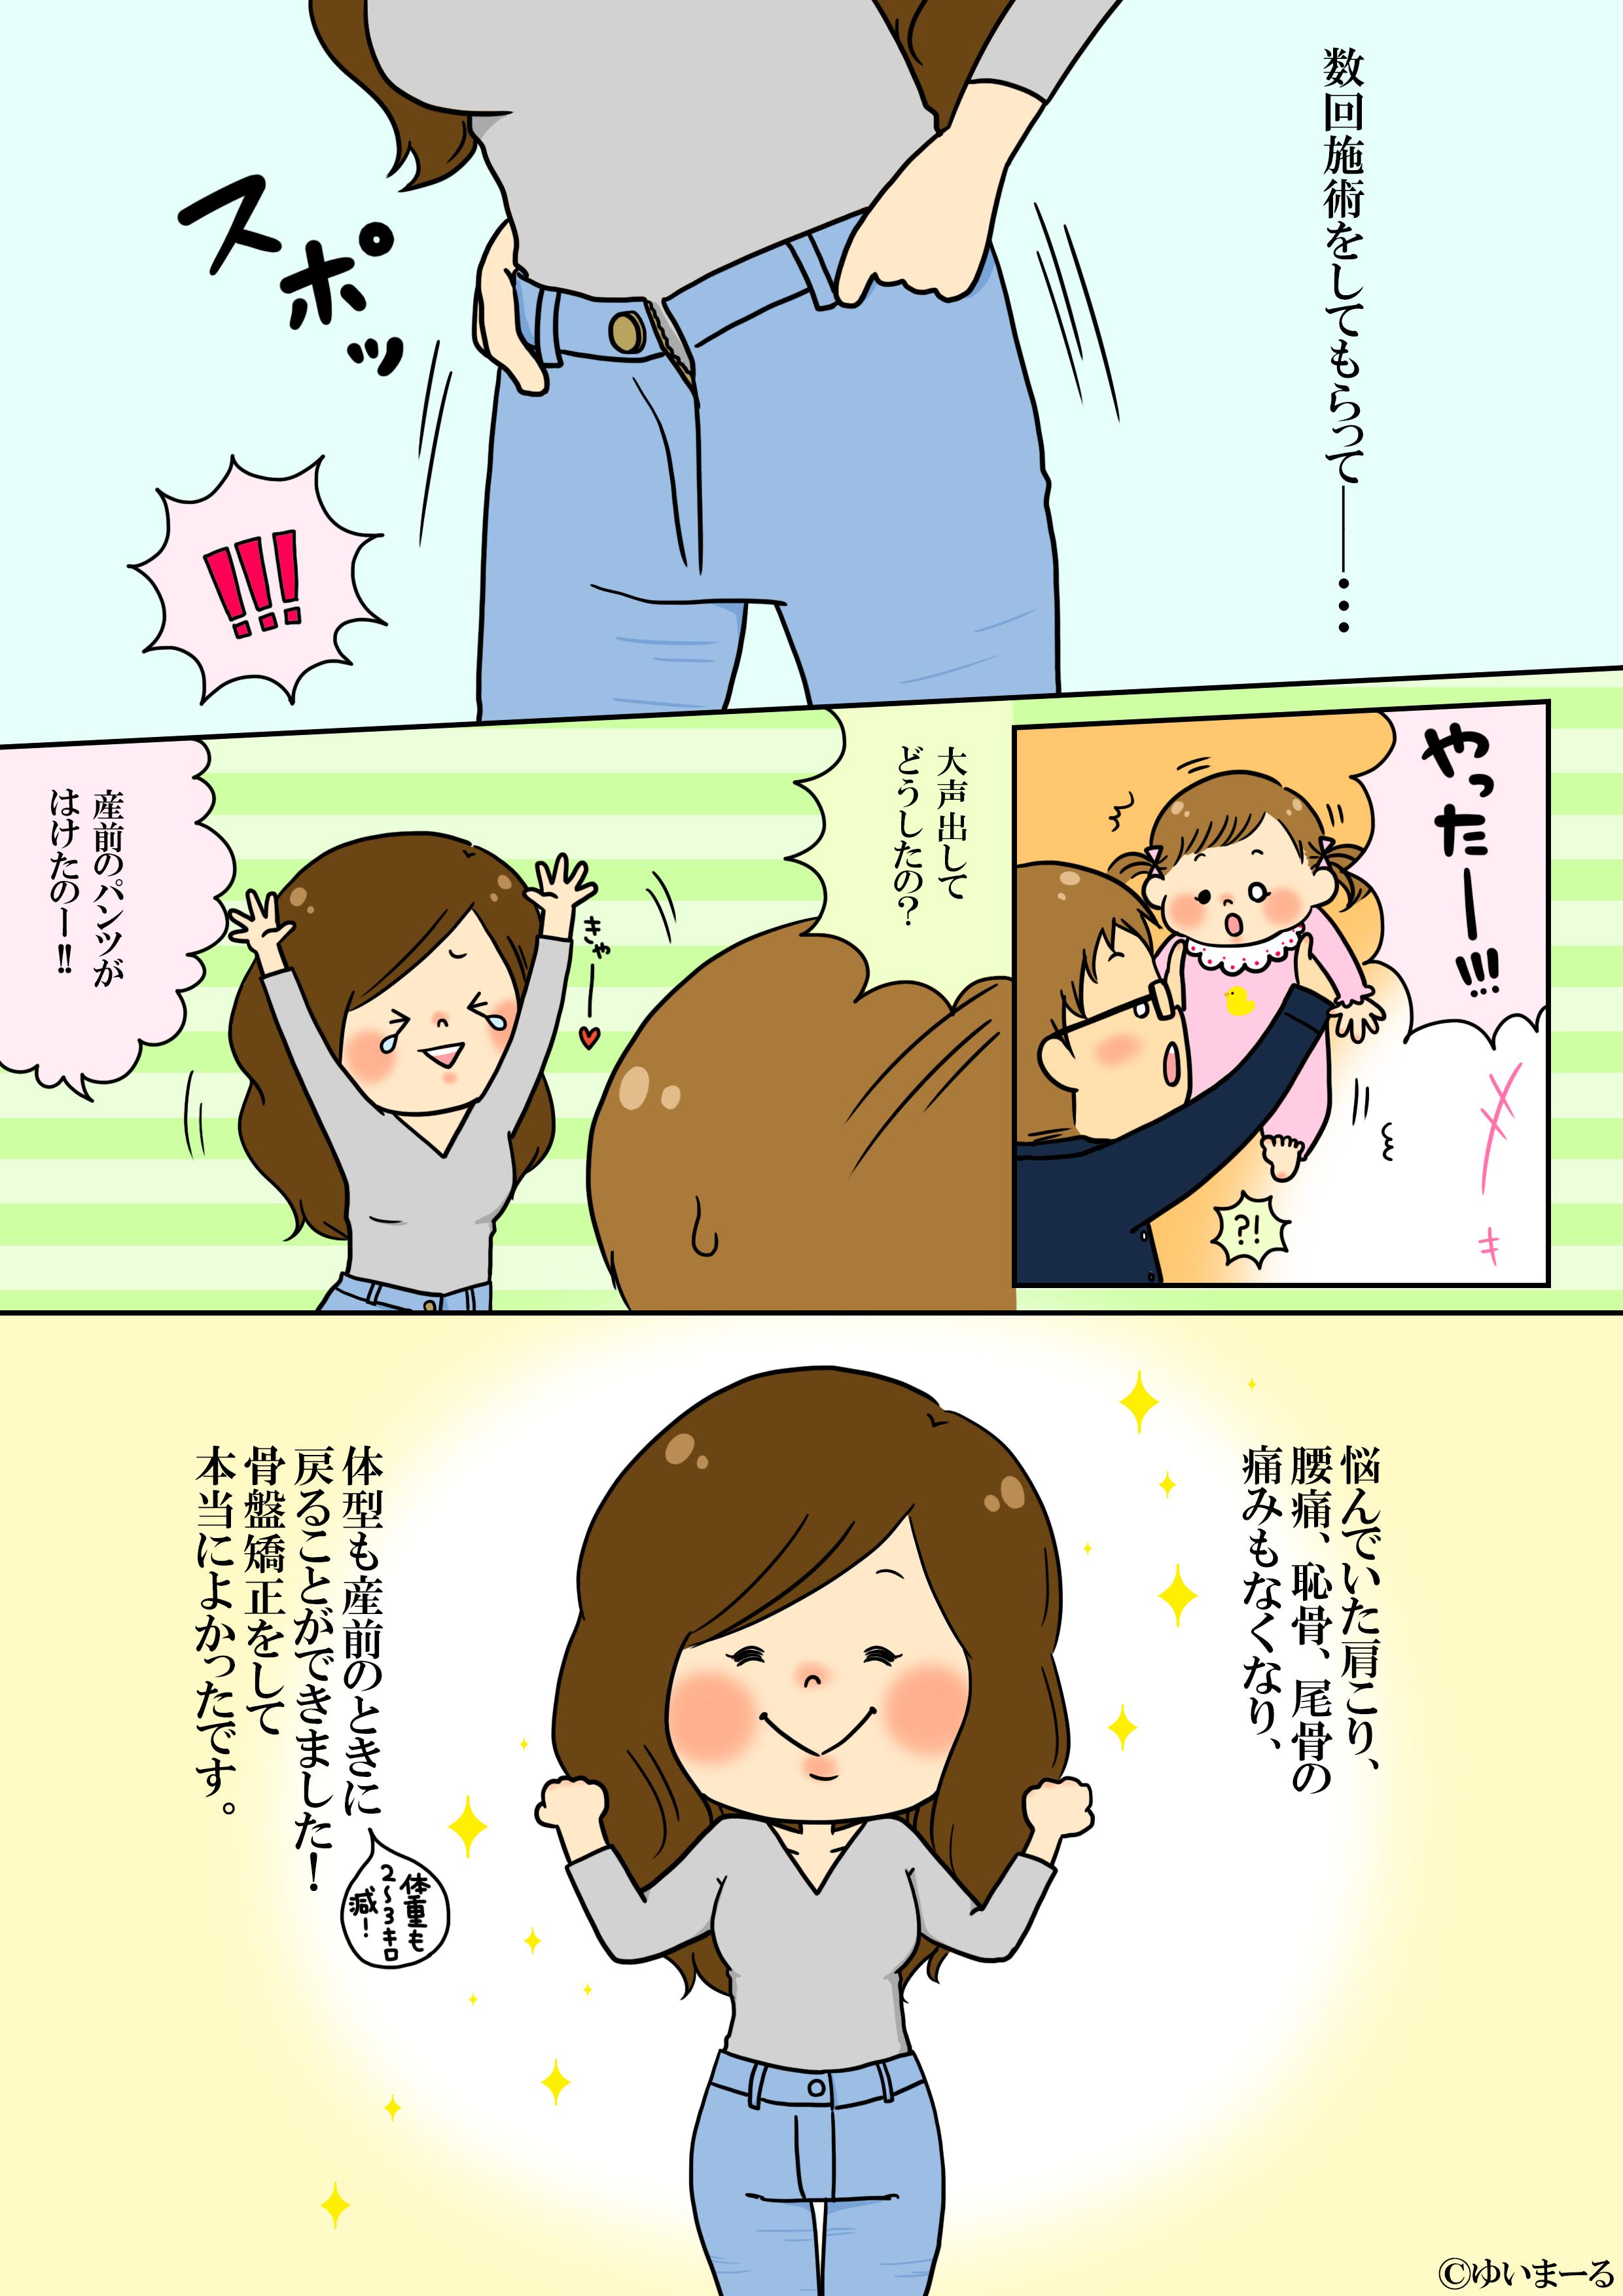 産後の骨盤矯正漫画4